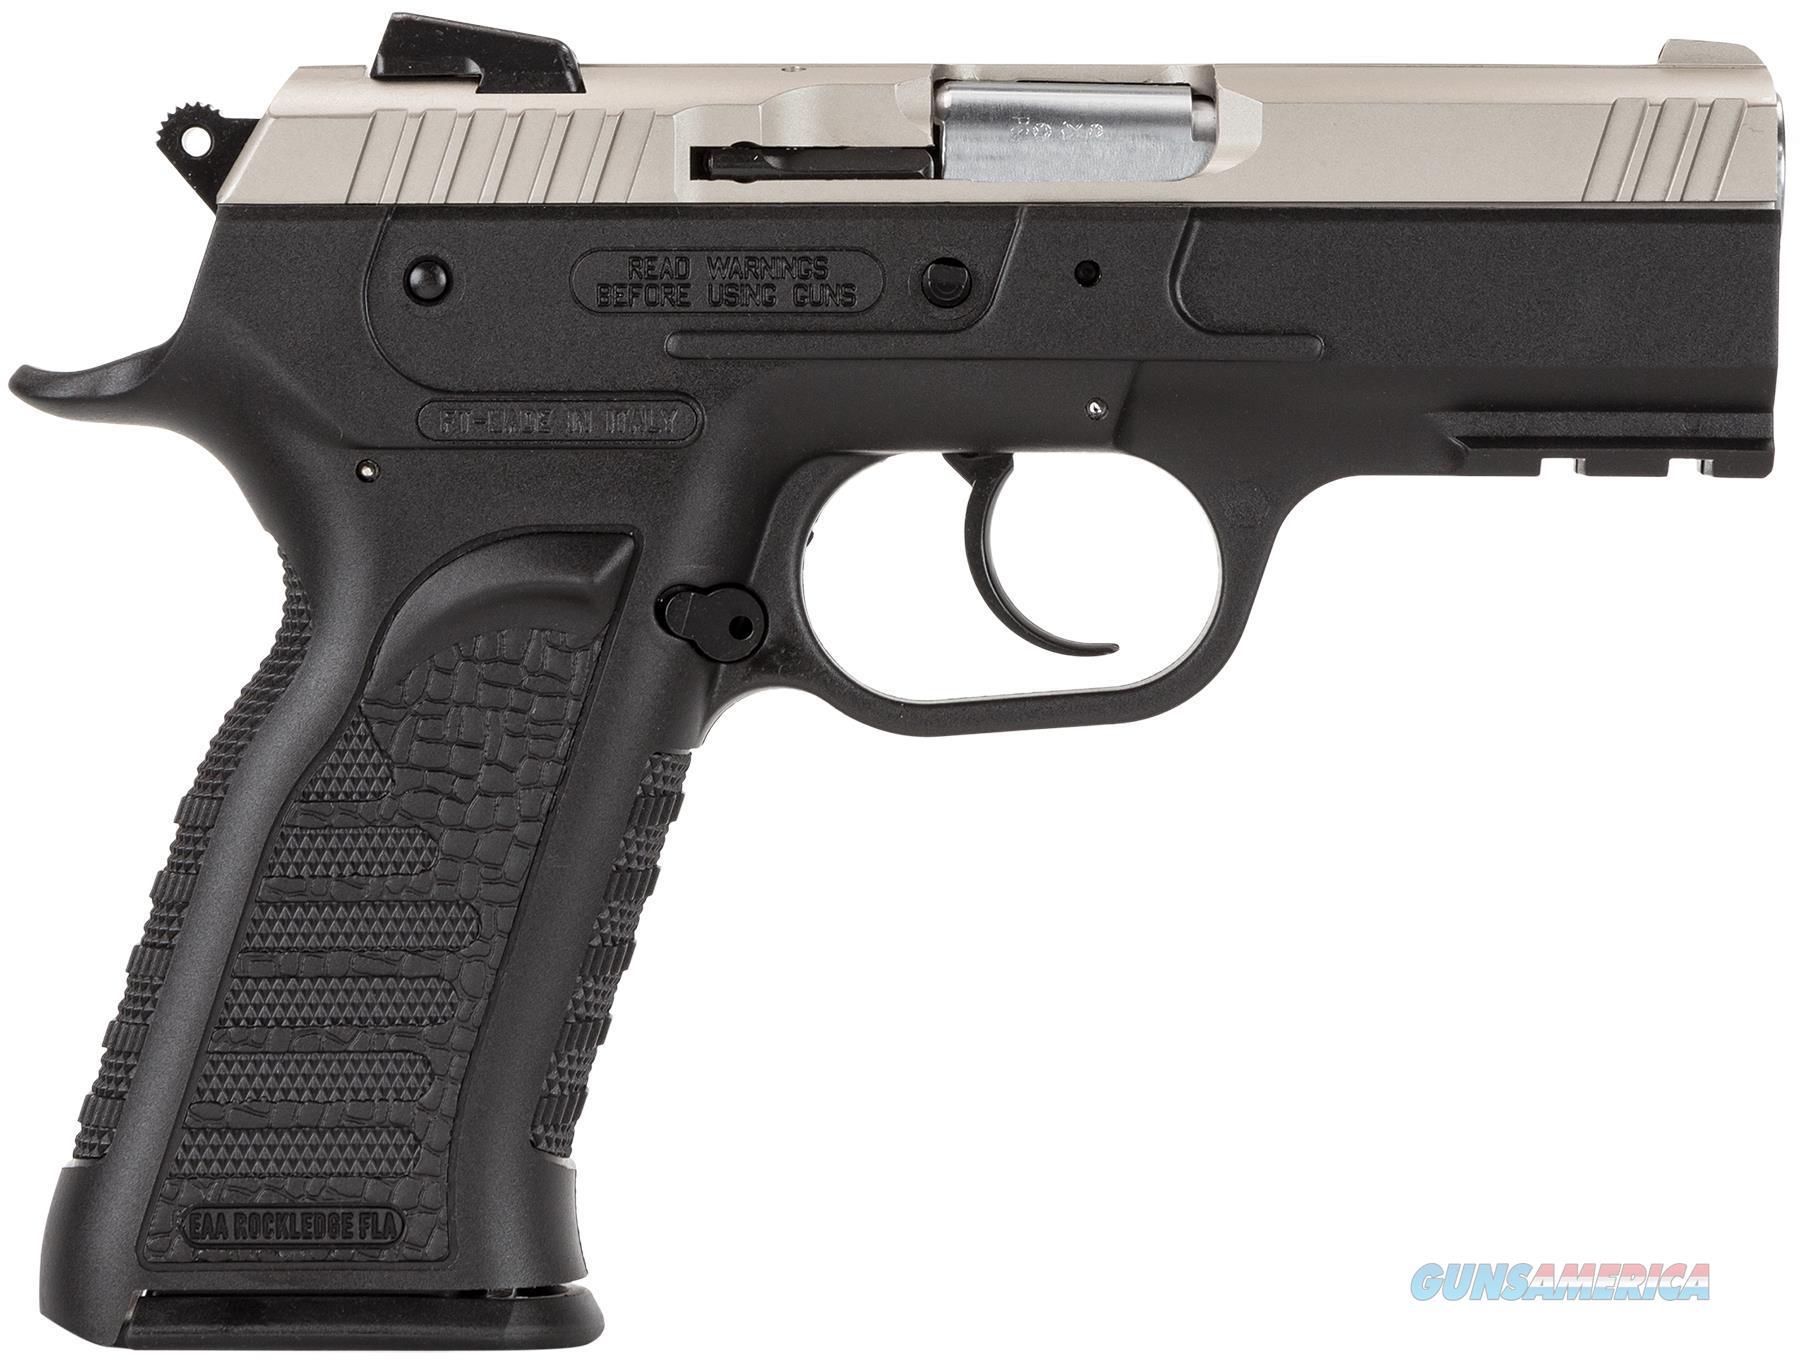 "Eaa 600245 Witness Polymer Carry Da/Sa 45Acp 3.6"" 10+1 Blk Syn Grip Ss 600245  Guns > Pistols > E Misc Pistols"